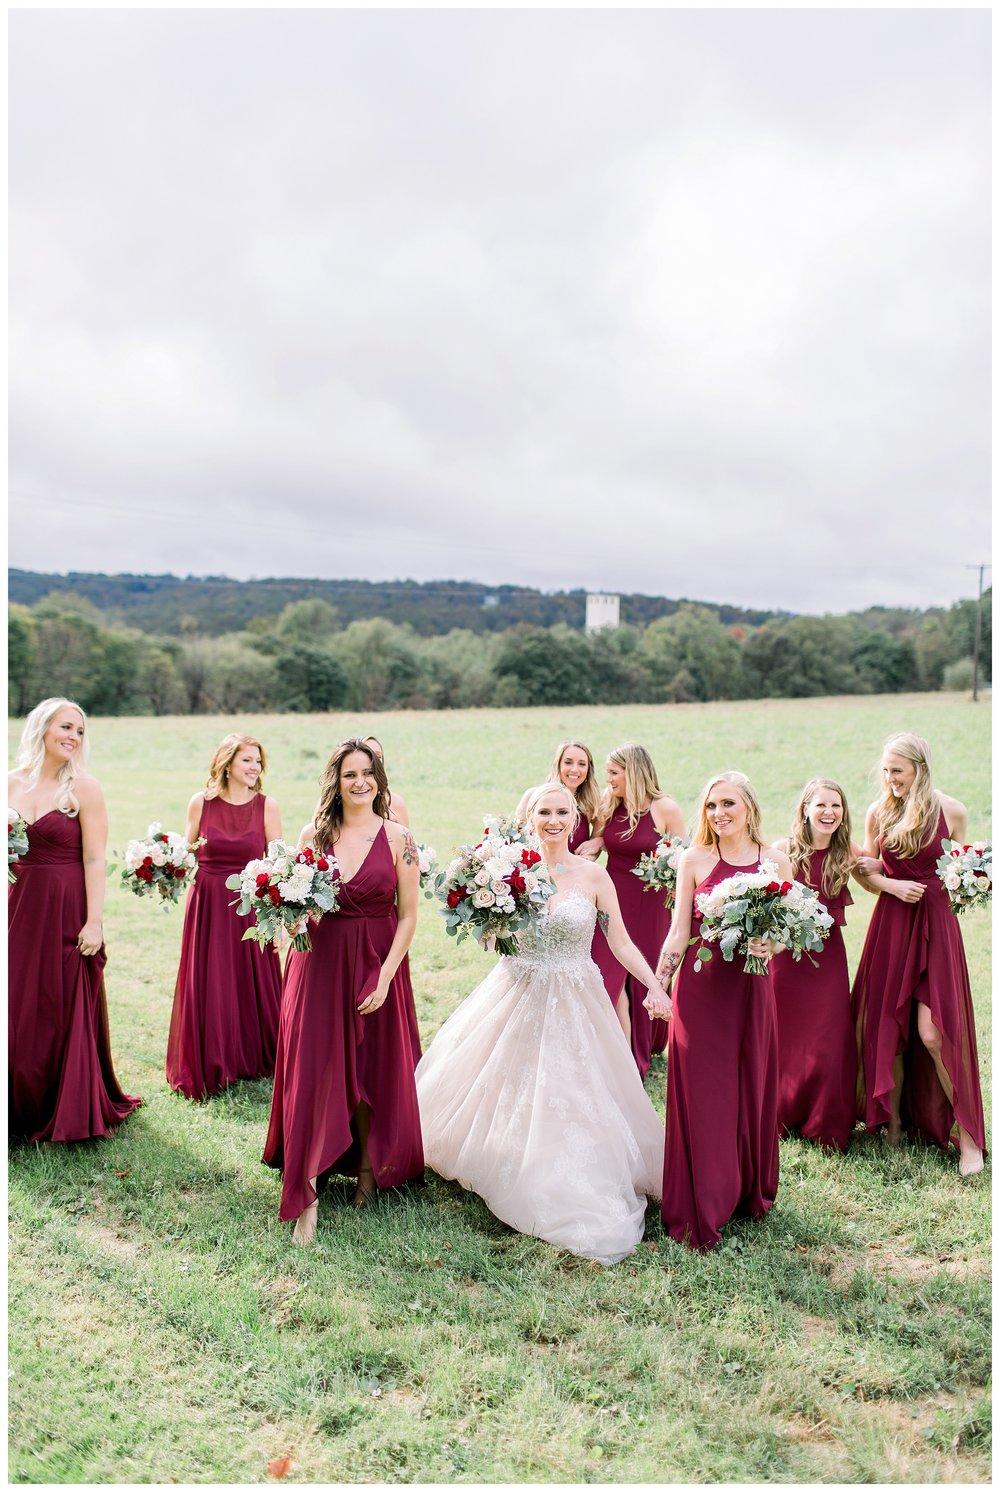 Whitehall Estate Wedding | Northern Virginia Wedding Photographer Kir Tuben_0049.jpg